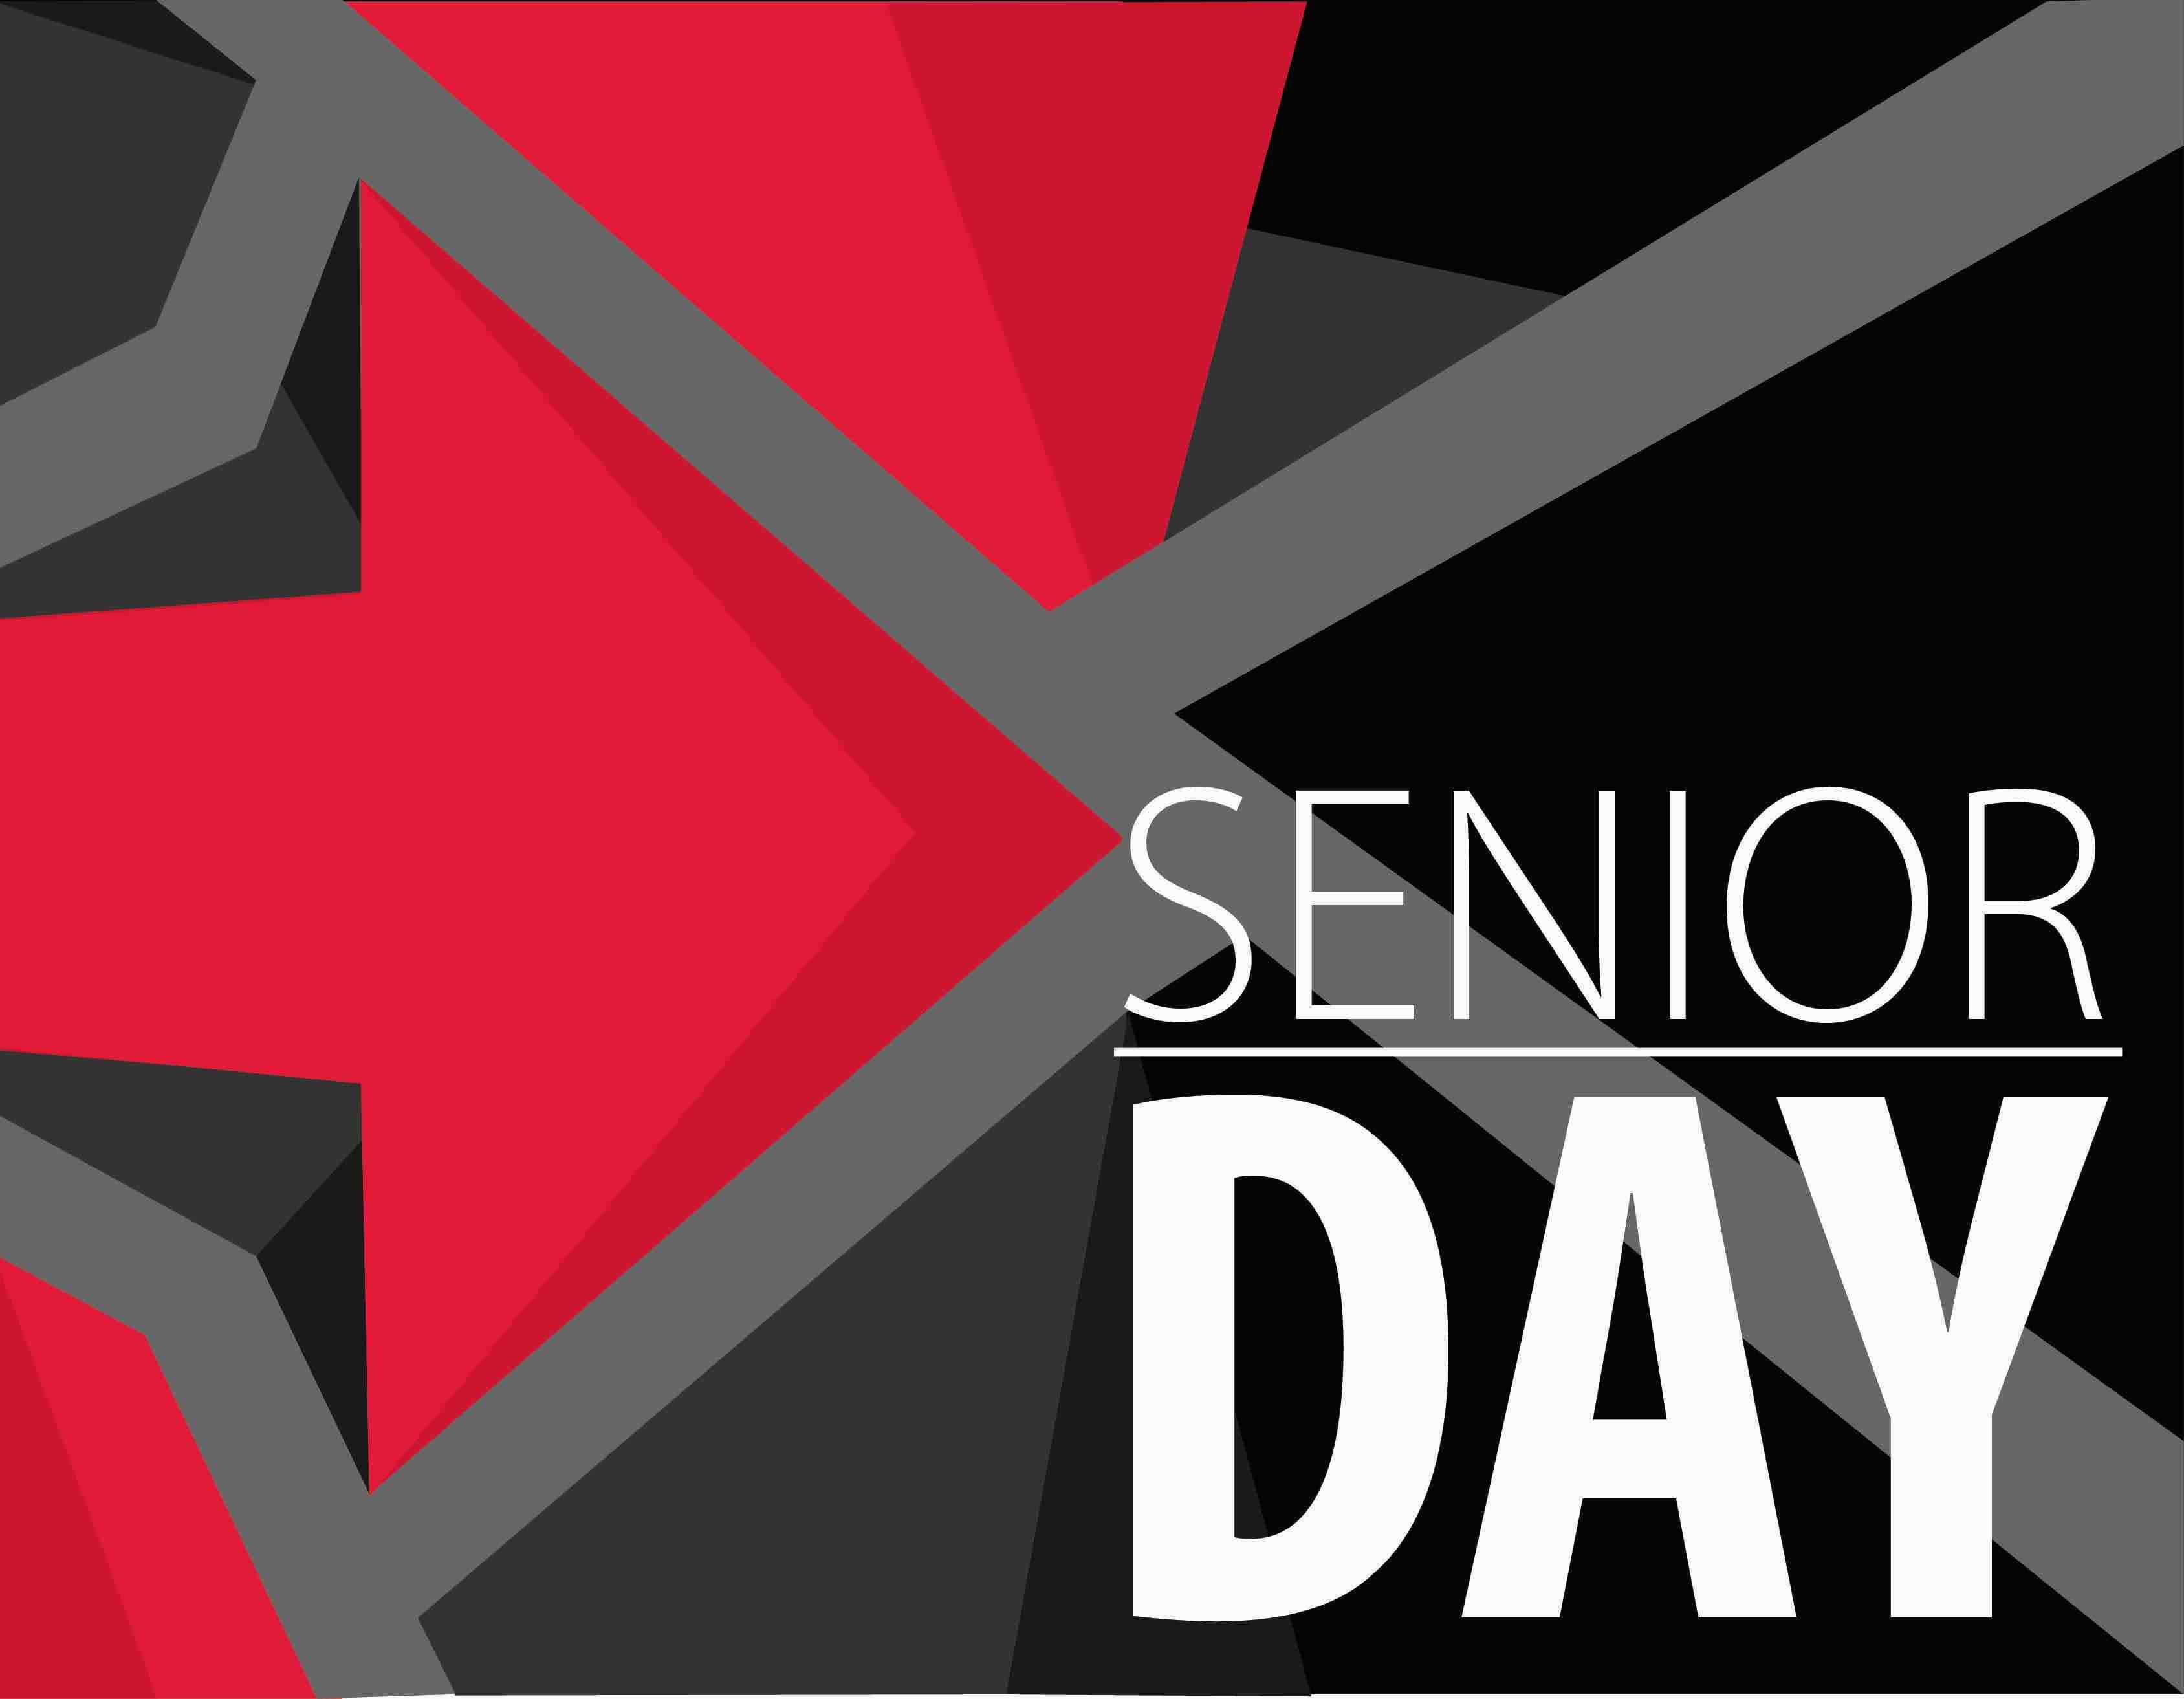 Senior Day Graphic